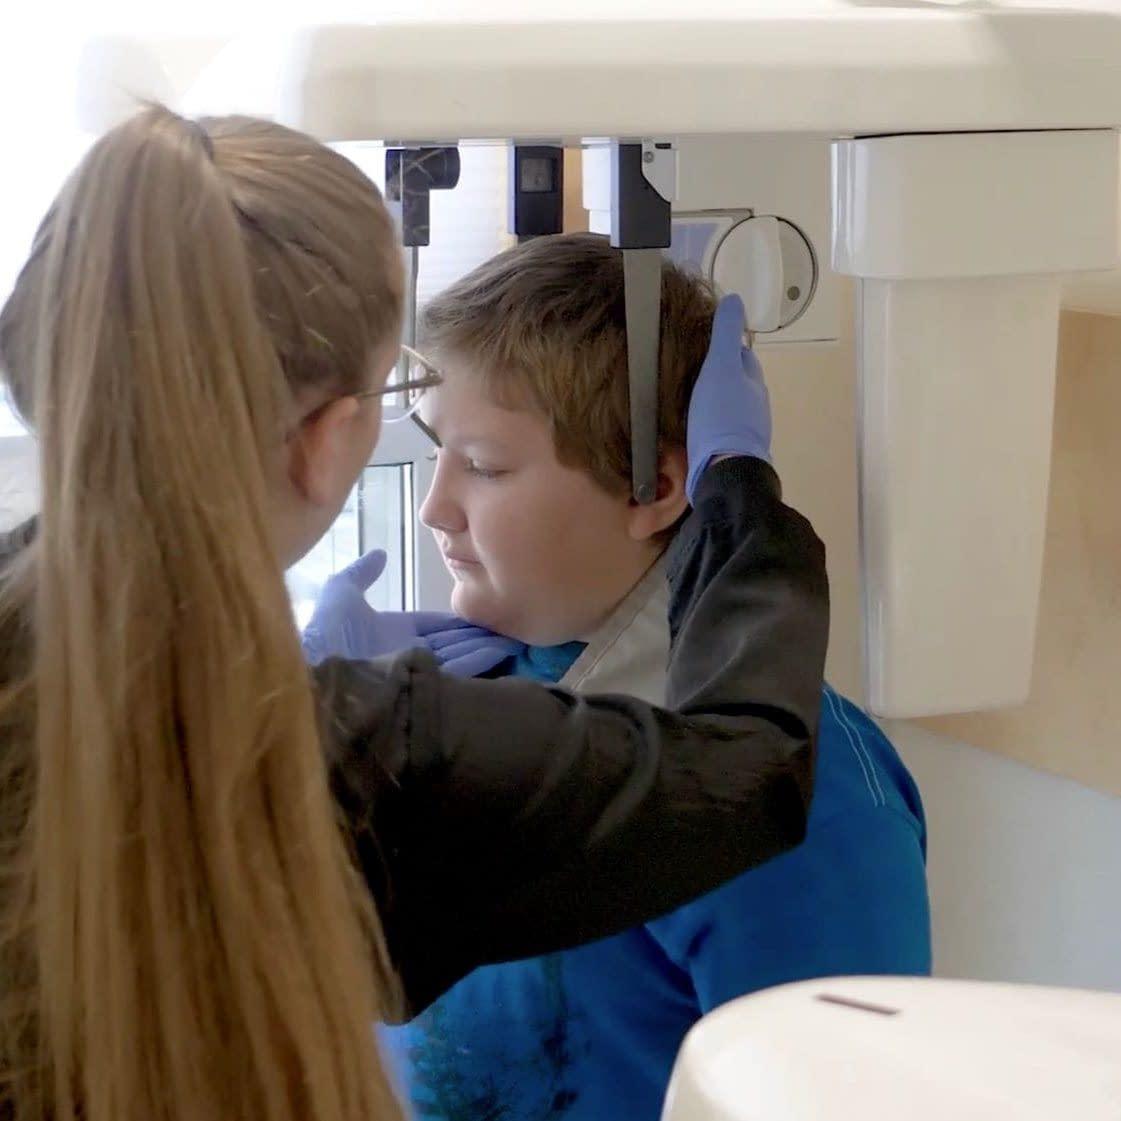 Young boy having x-rays taken